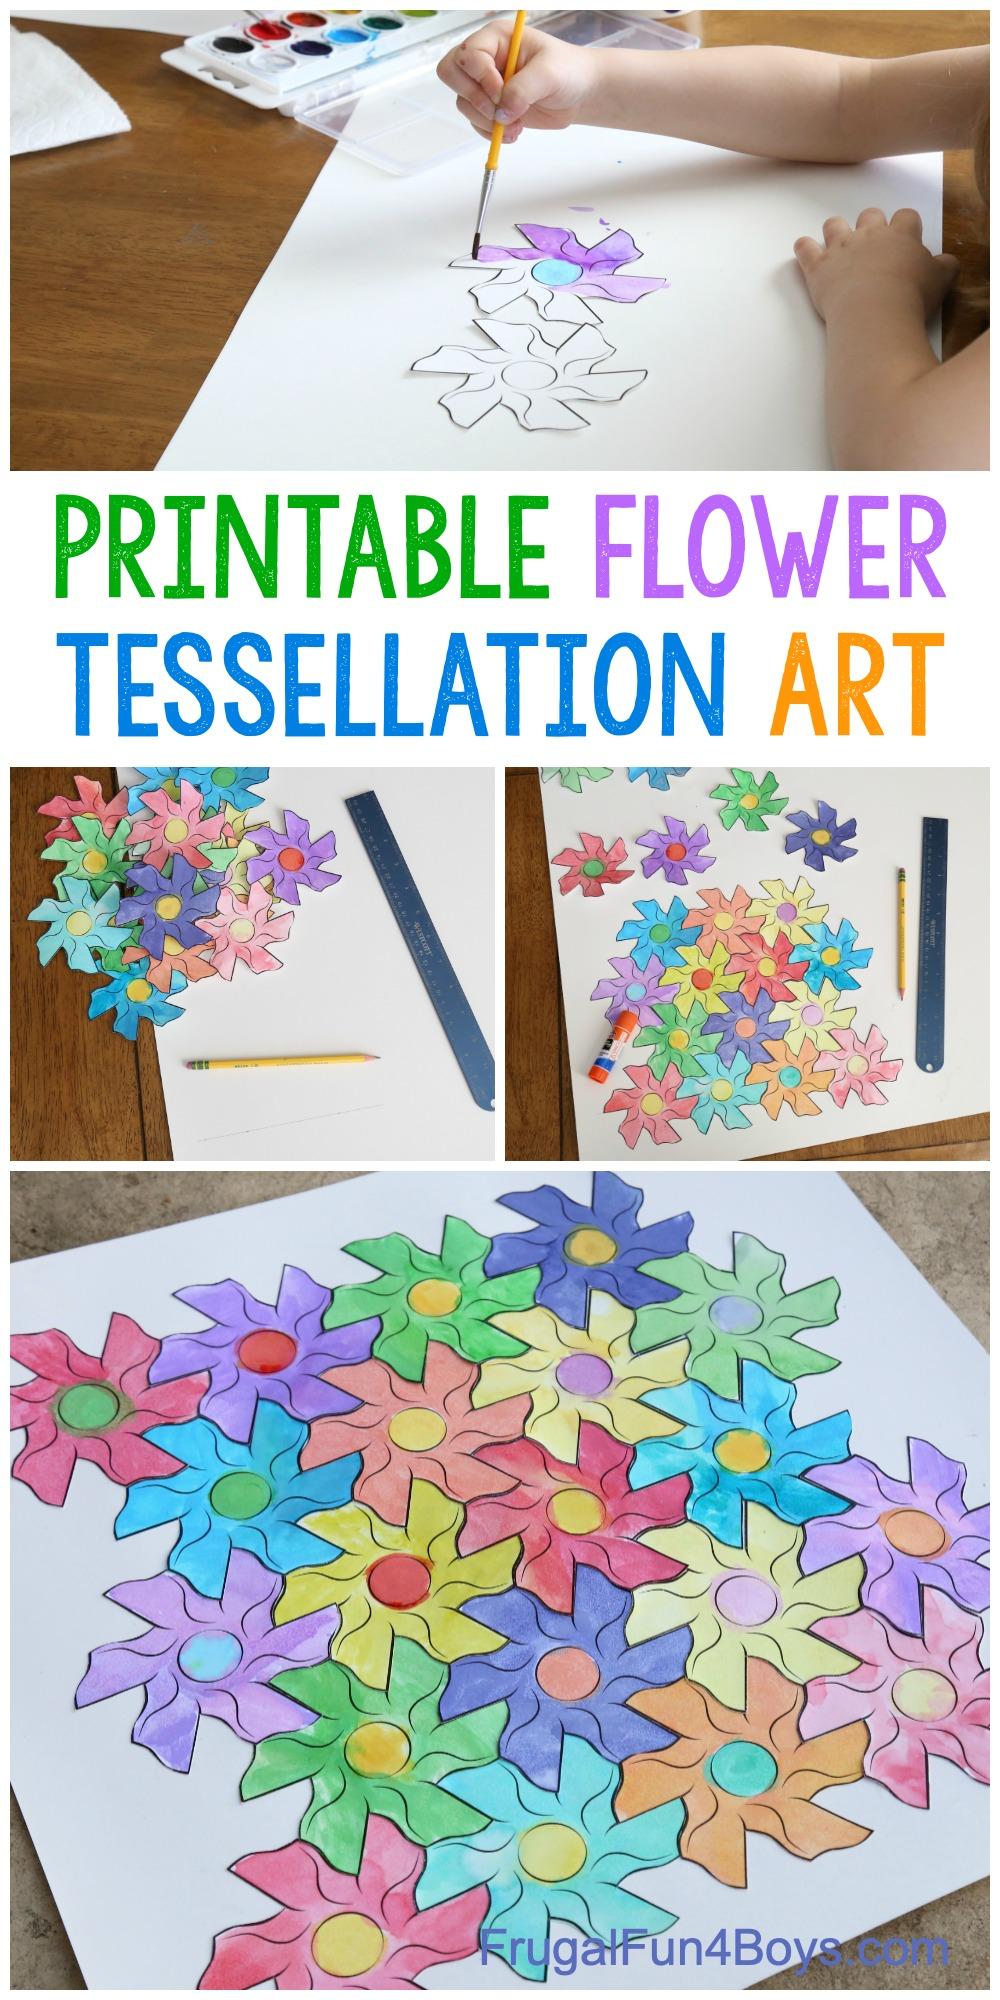 Flower Tessellation Activity - Printable Template